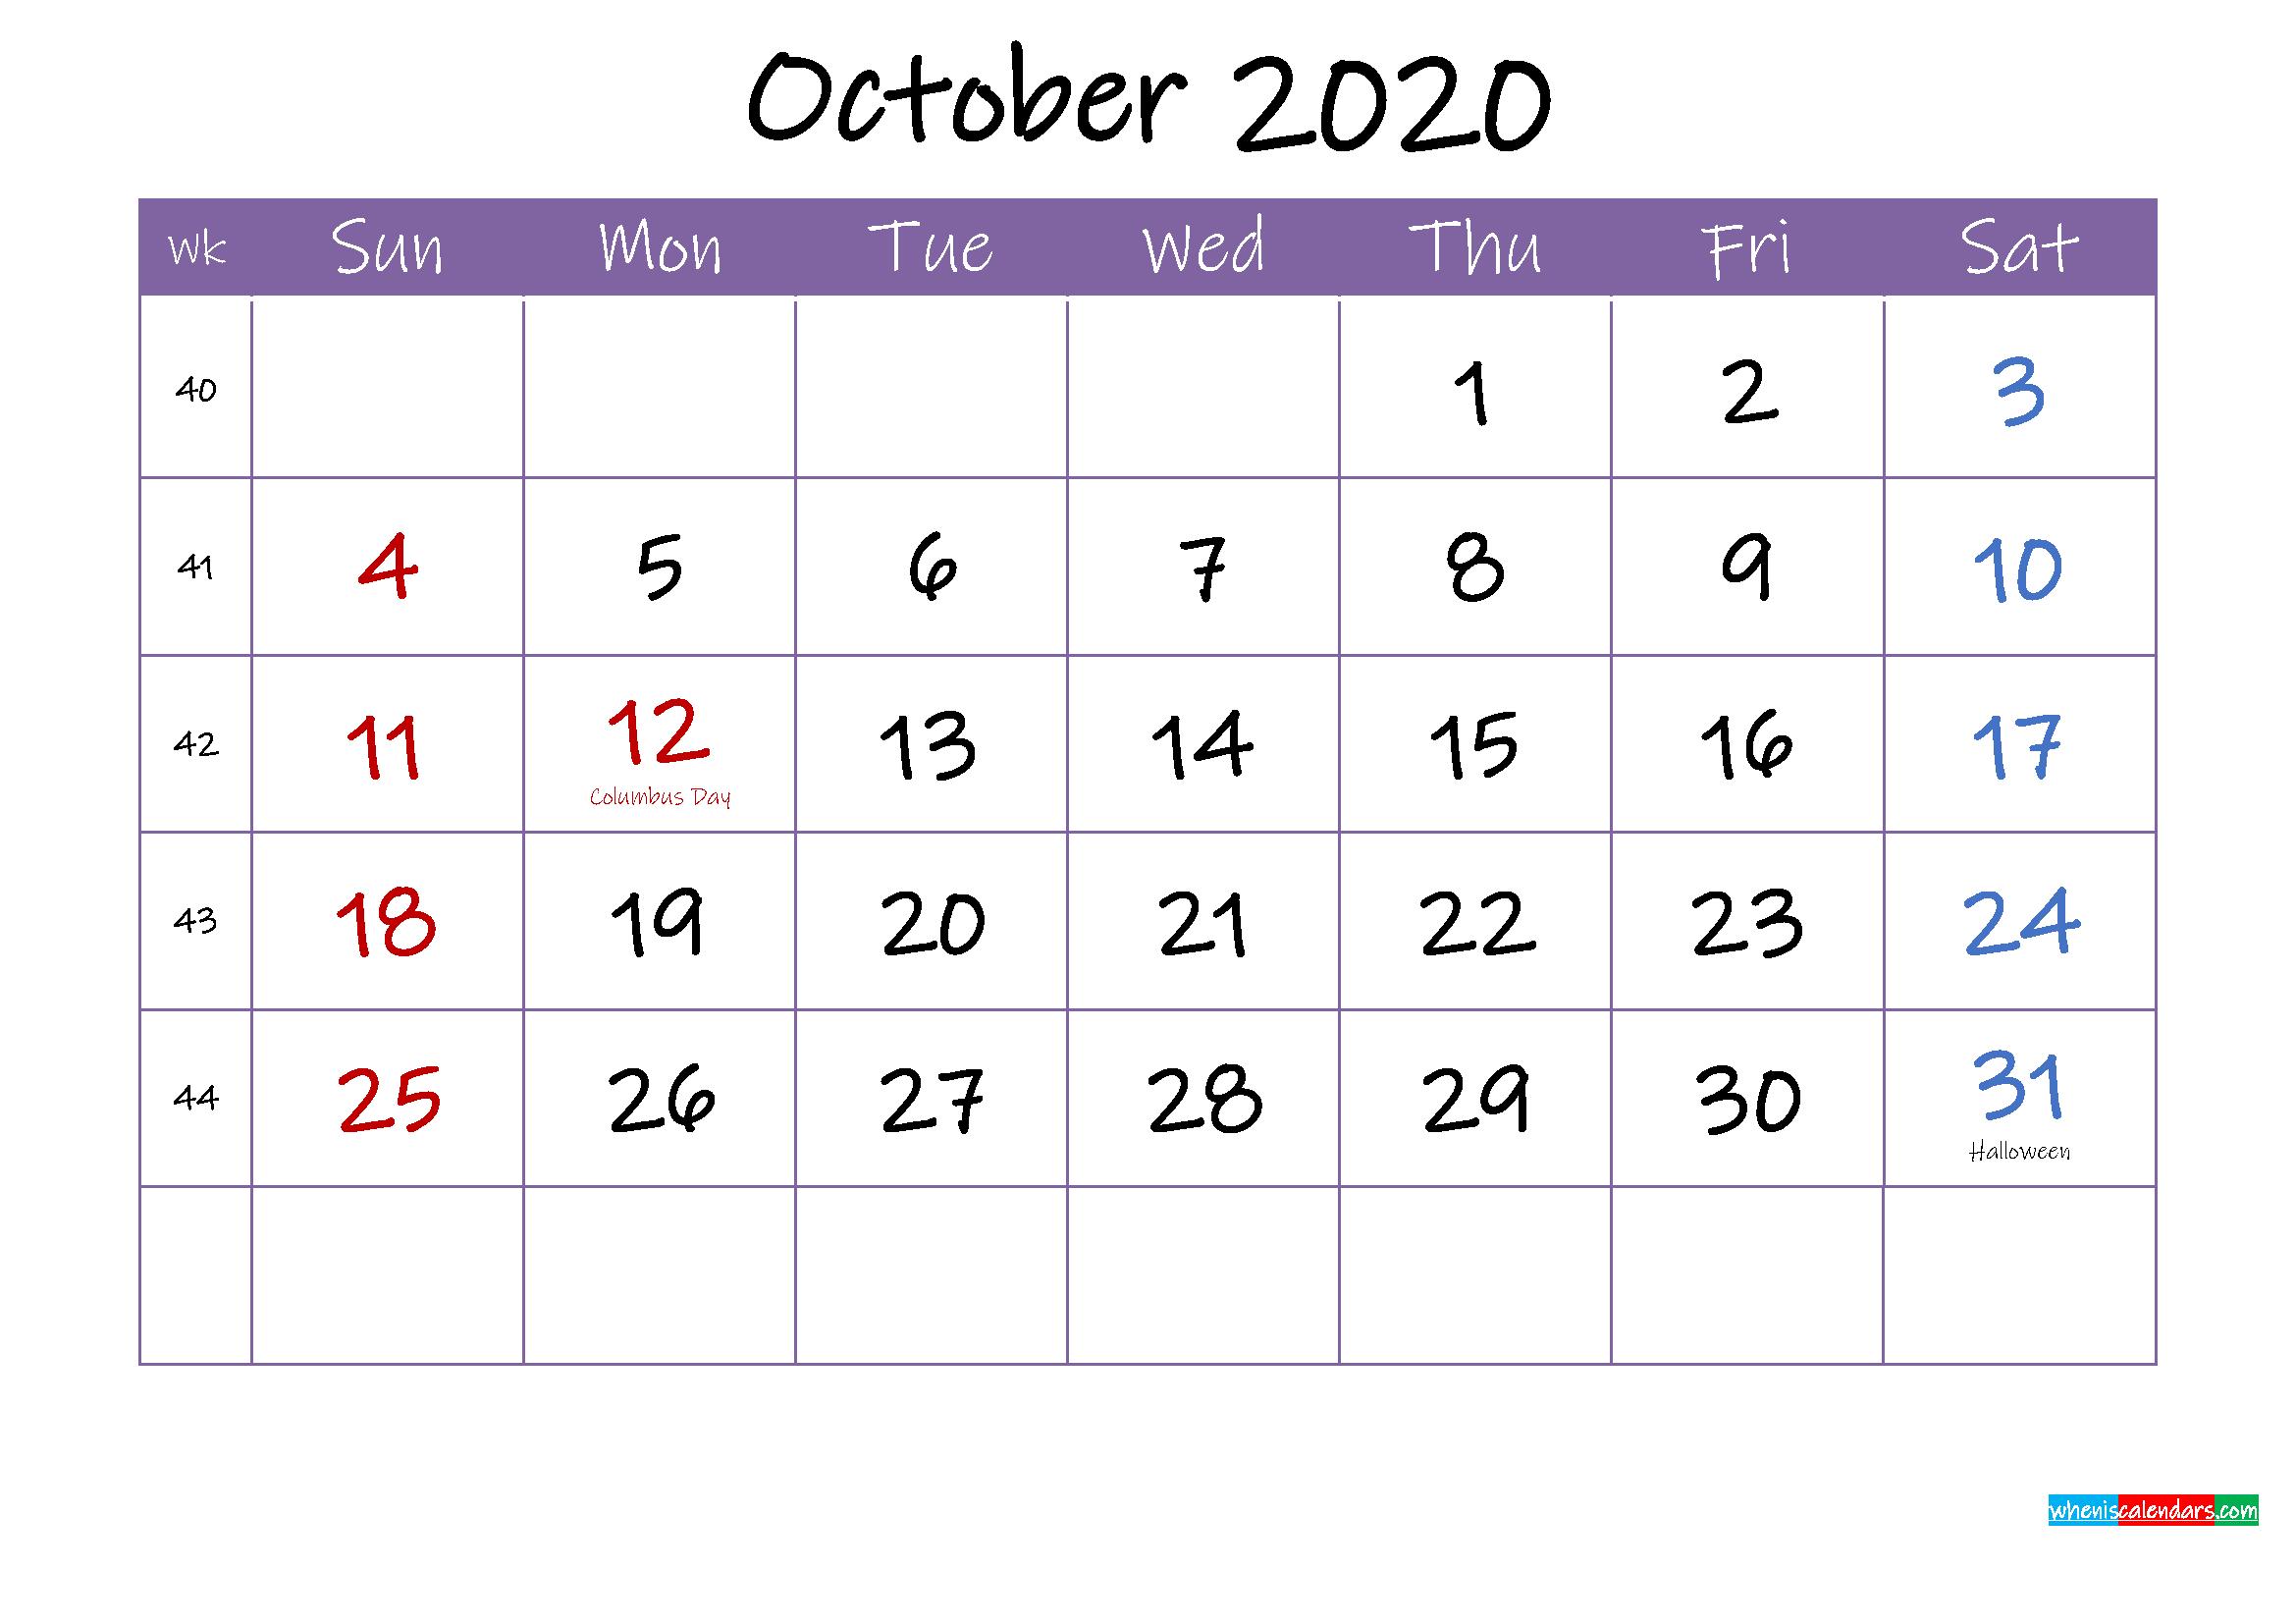 October 2020 Calendar with Holidays Printable